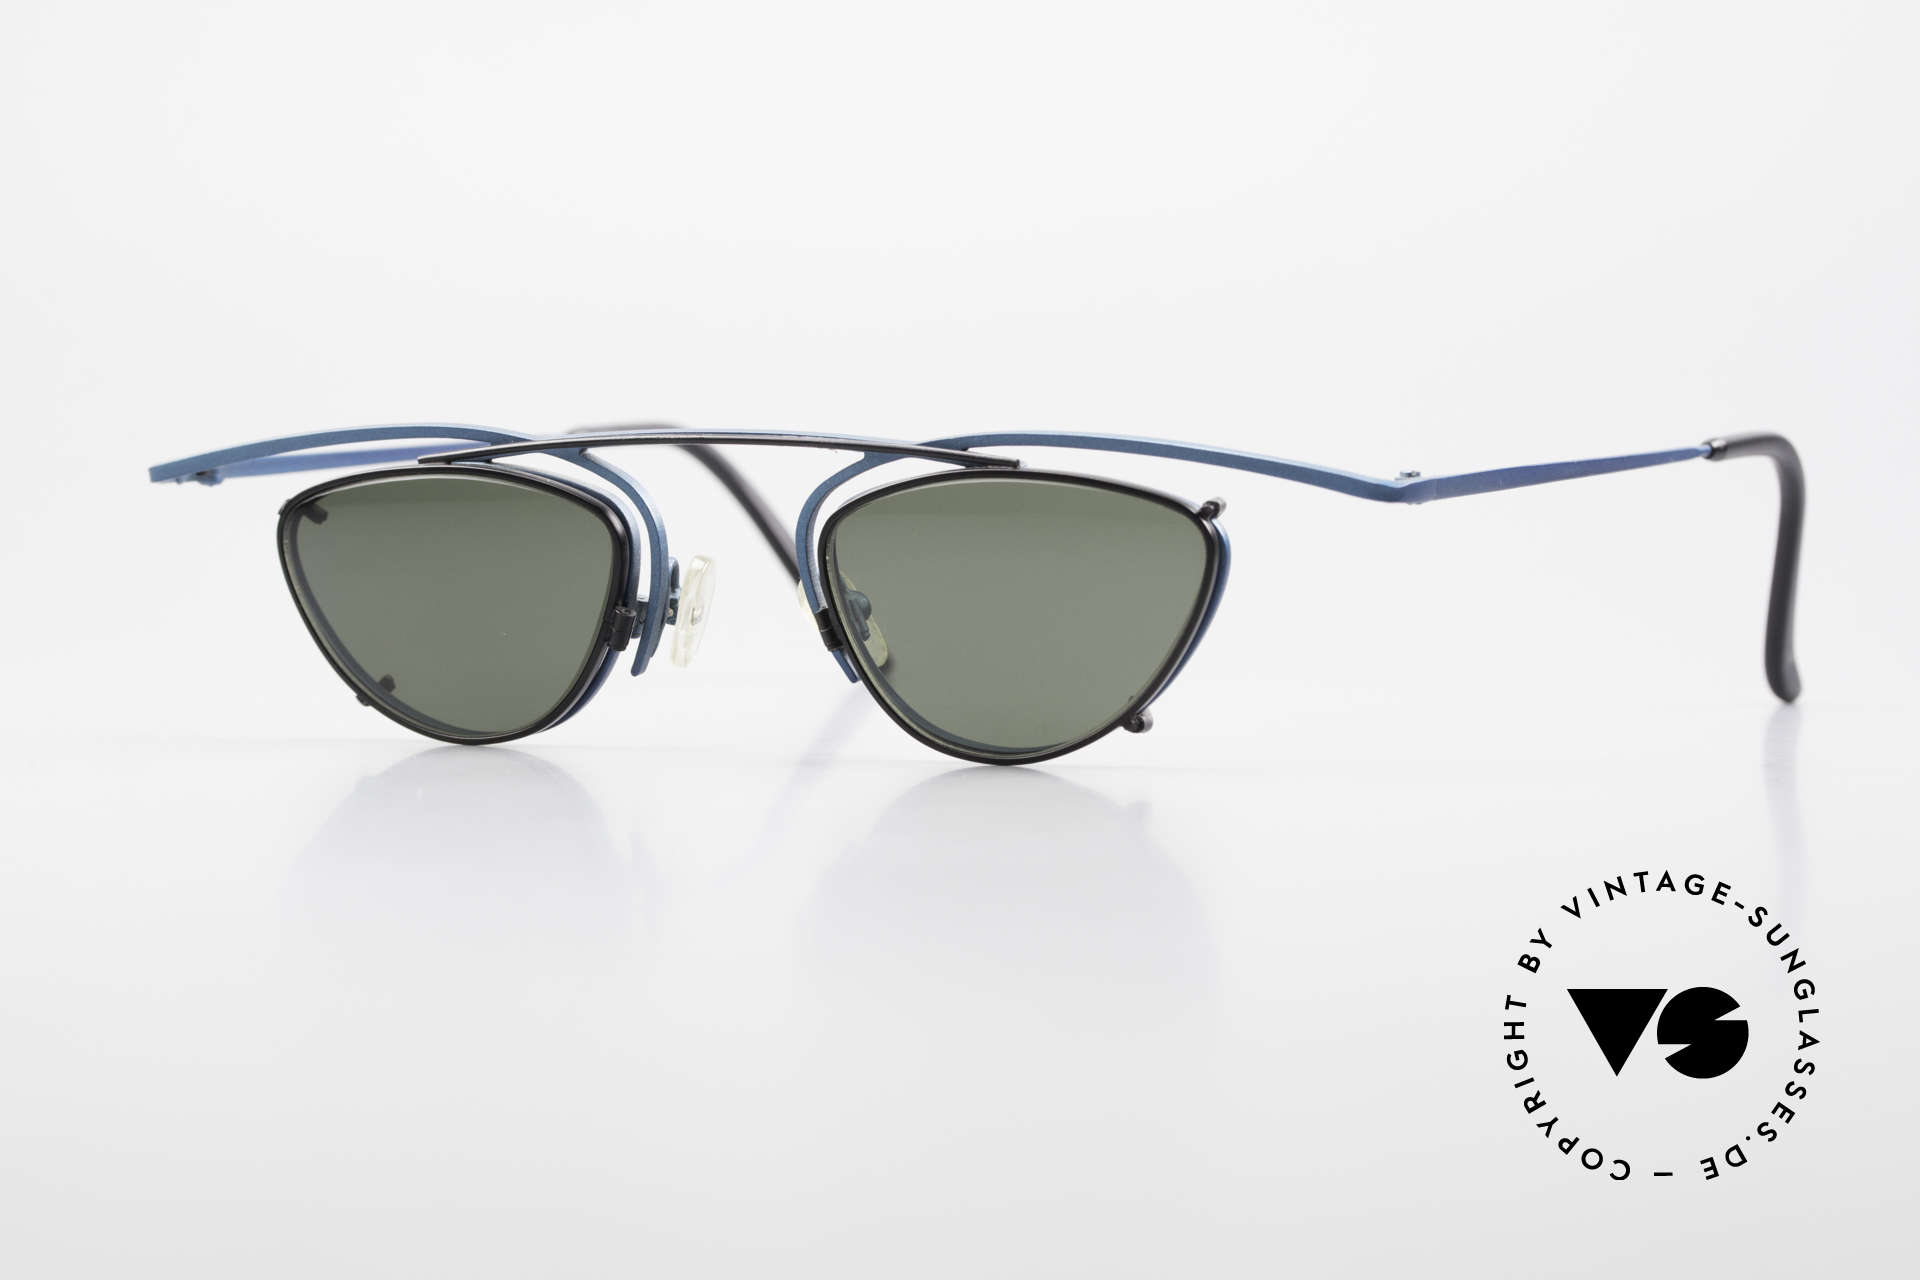 Theo Belgium Rhum Designer Glasses With Clip On, interesting 90's designer eyeglasses by THEO Belgium, Made for Men and Women